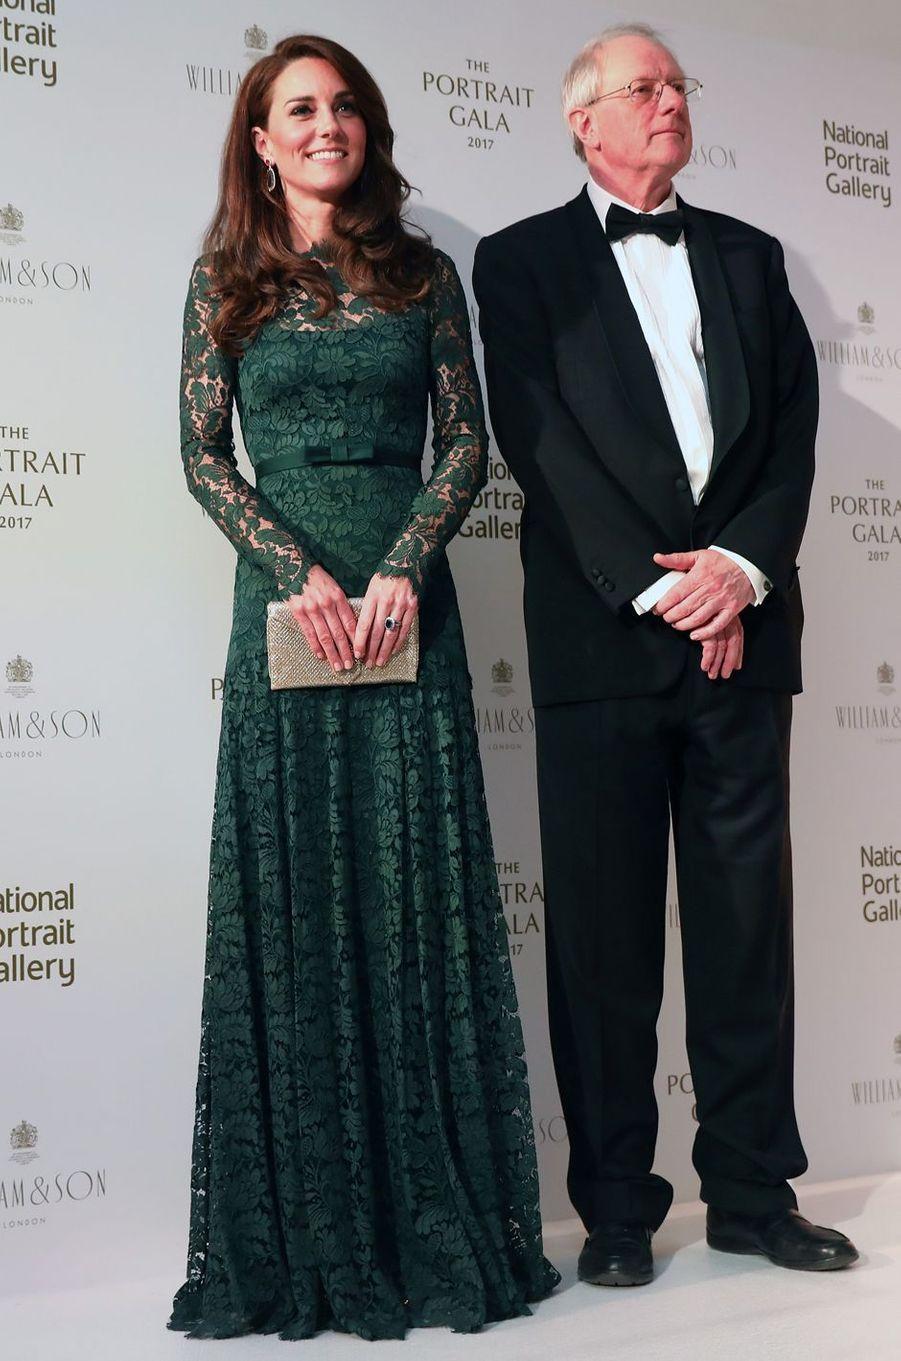 La duchesse Catherine de Cambridge en Temperley London, le 28 mars 2017